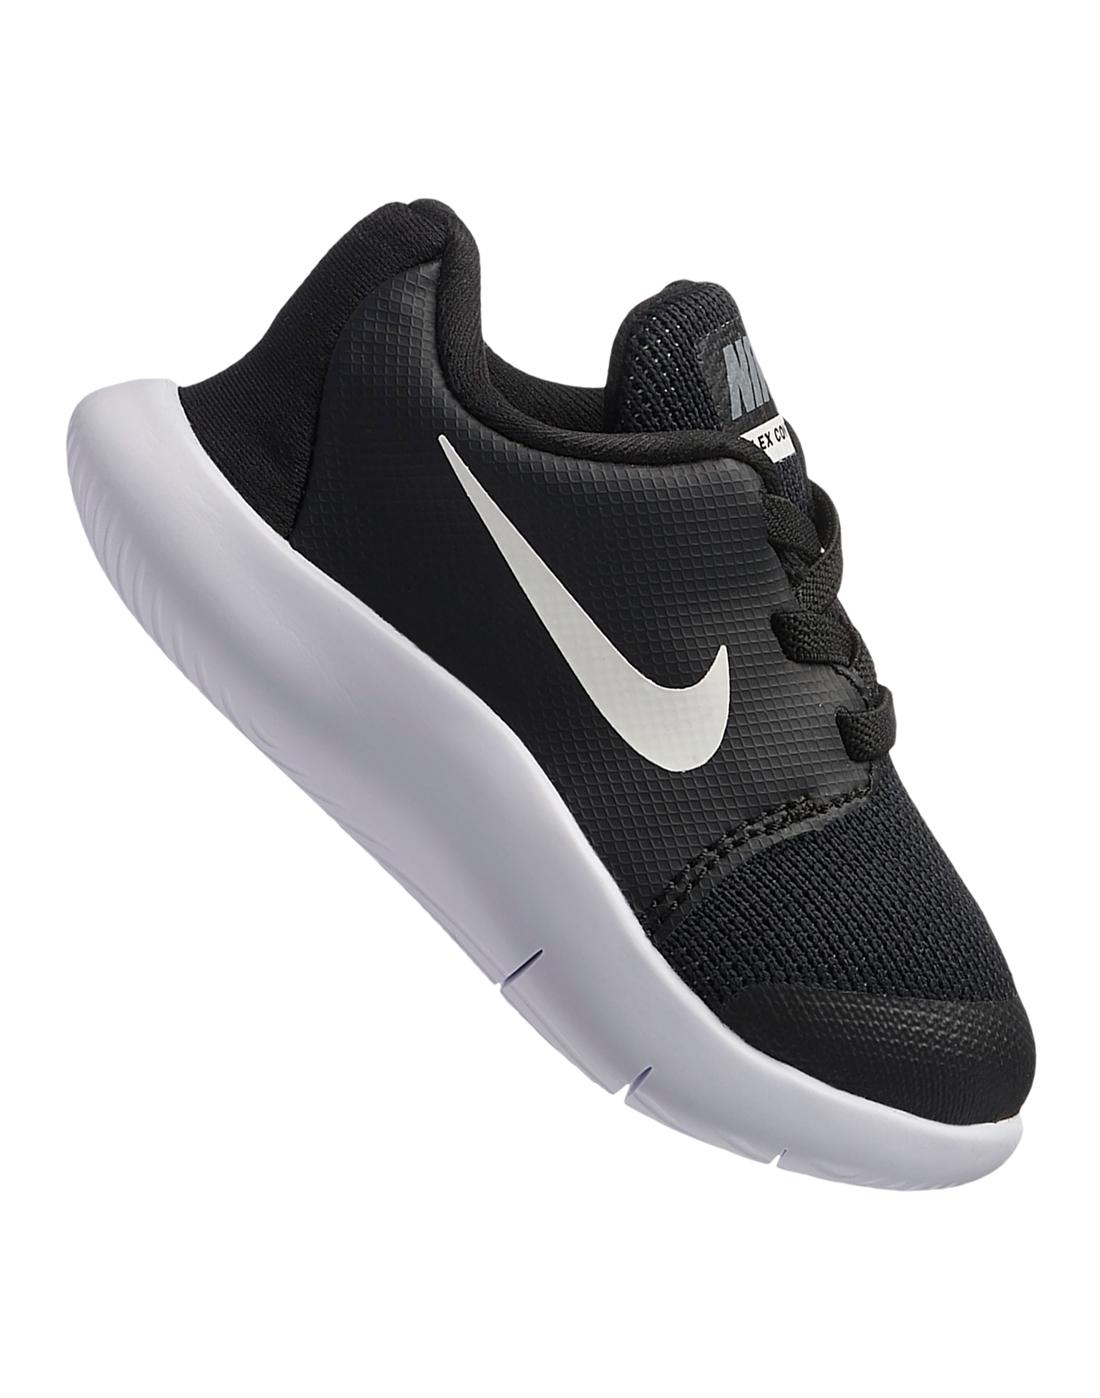 4c64b20c23a54 Nike Infant Boys Flex Contact